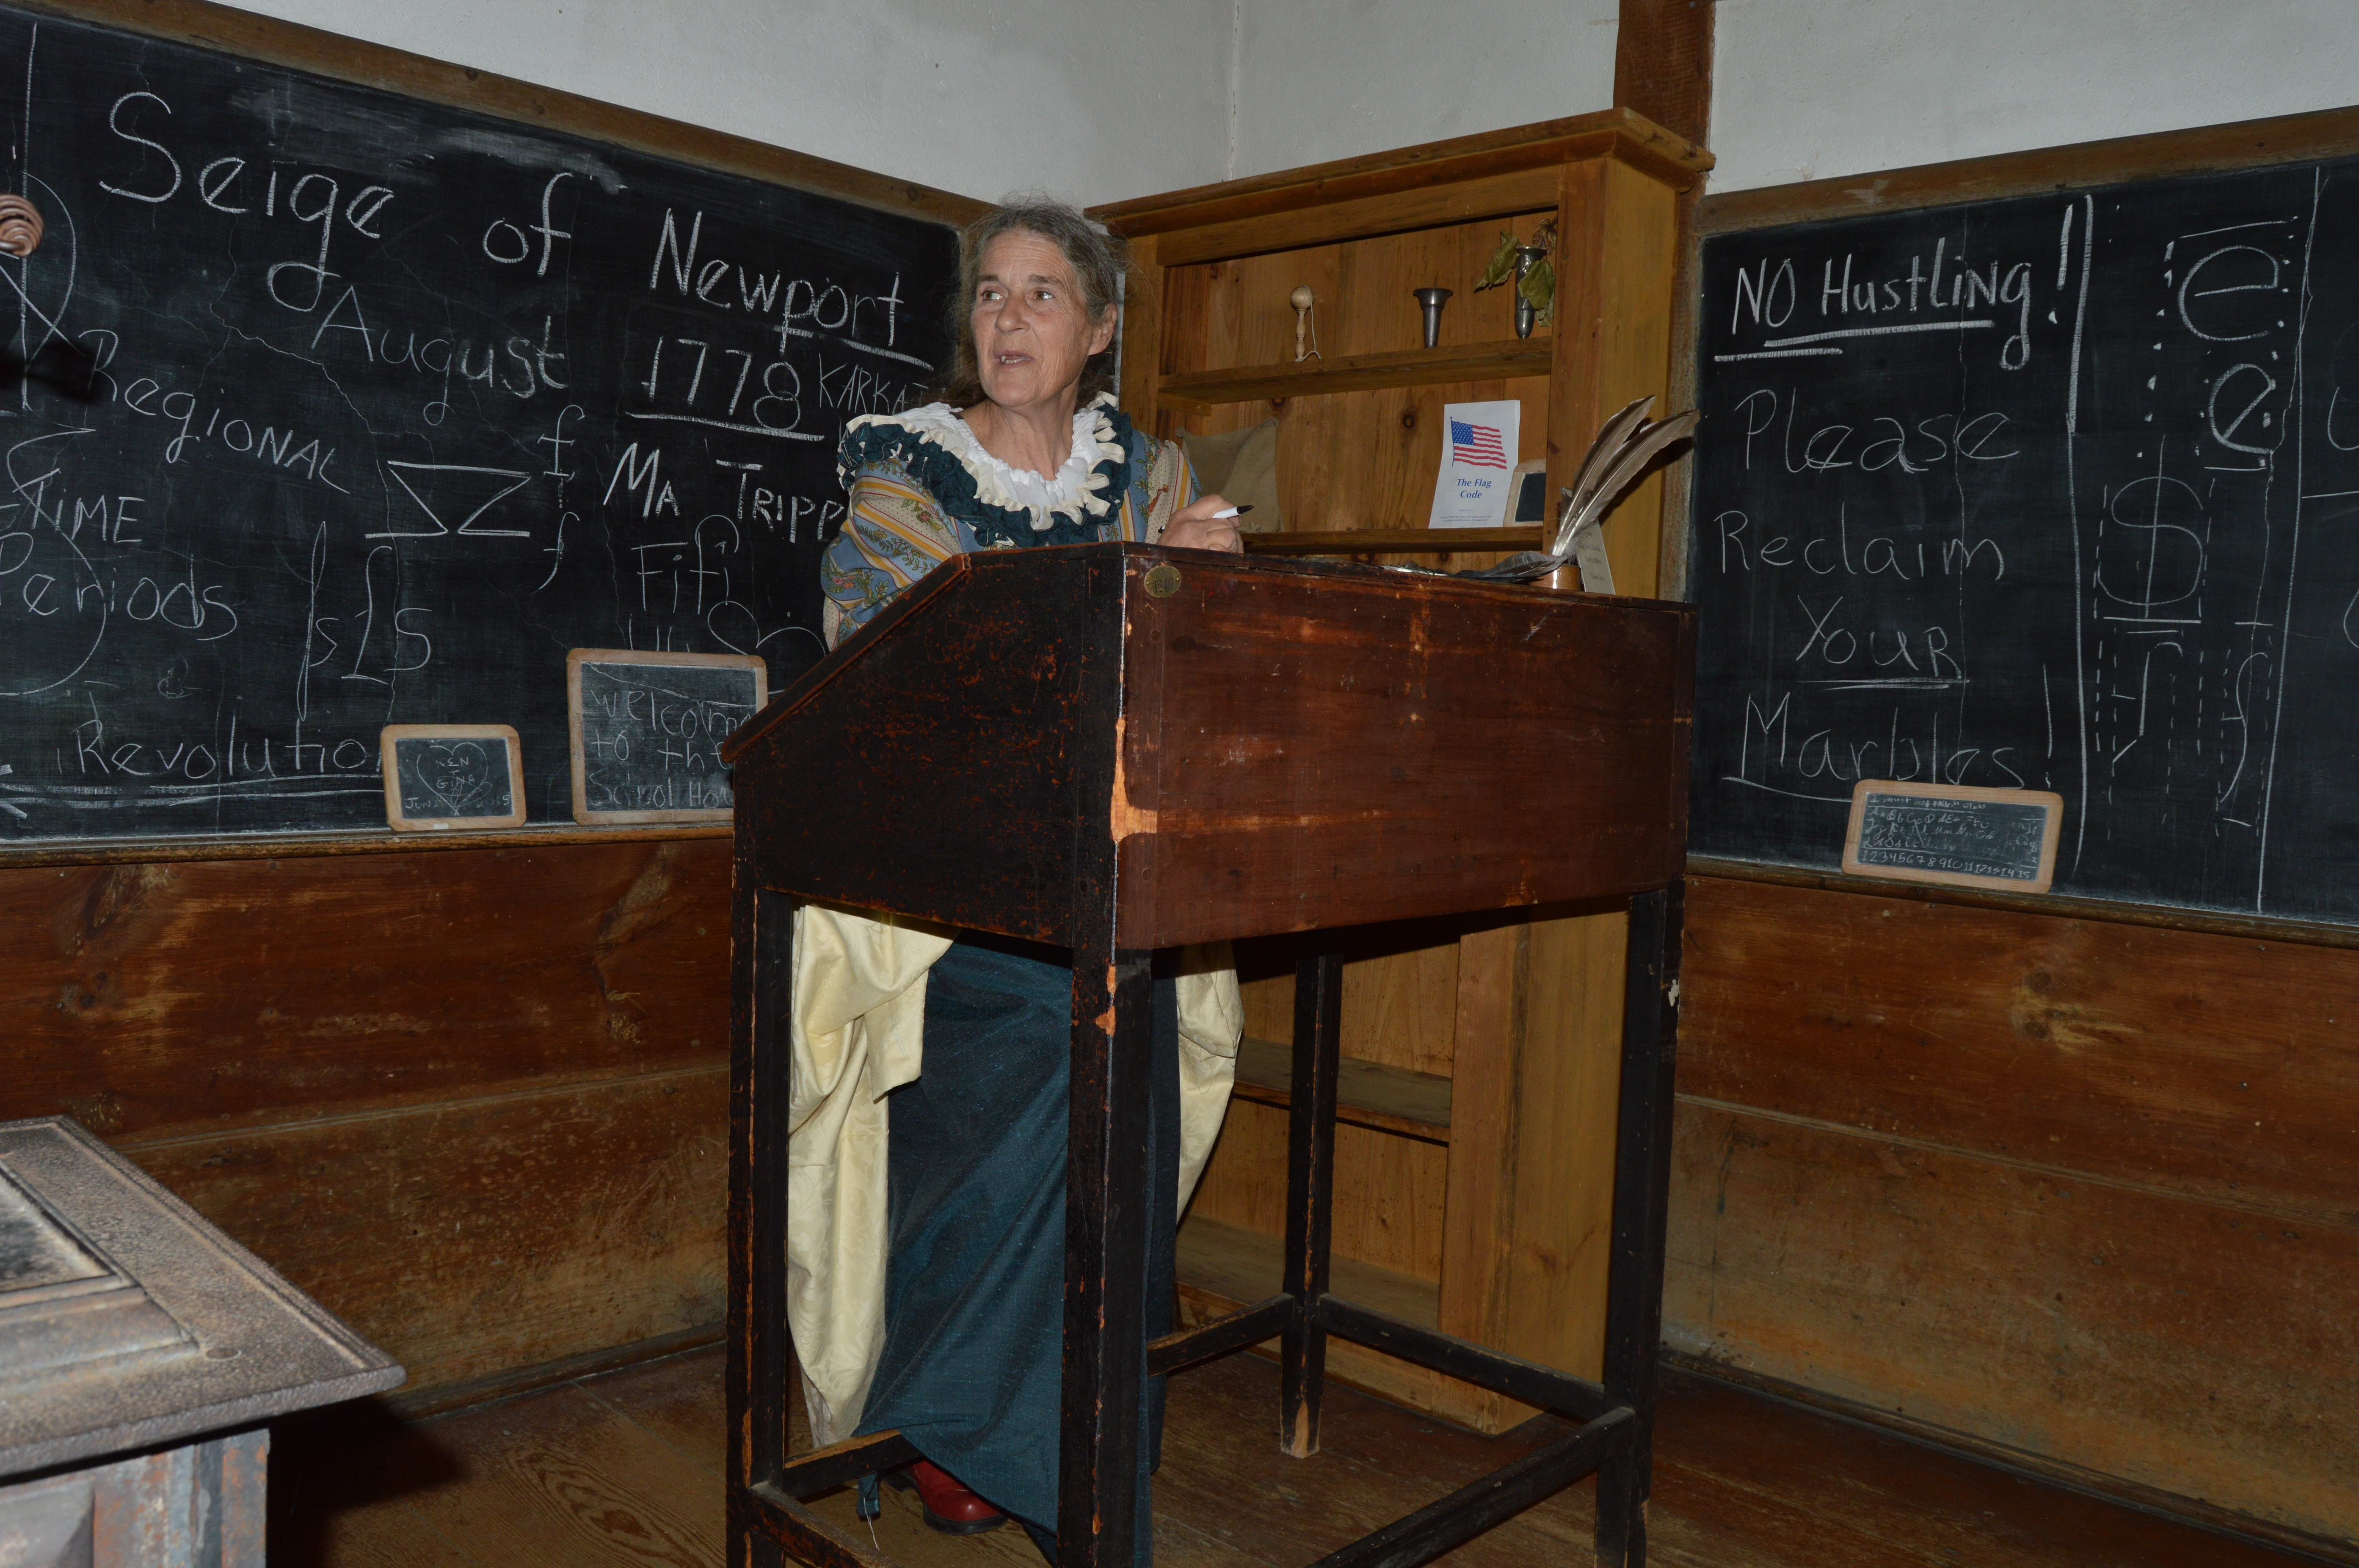 Wayside Inn Colonial Faire (Sudbury, MA) | New England Nomad